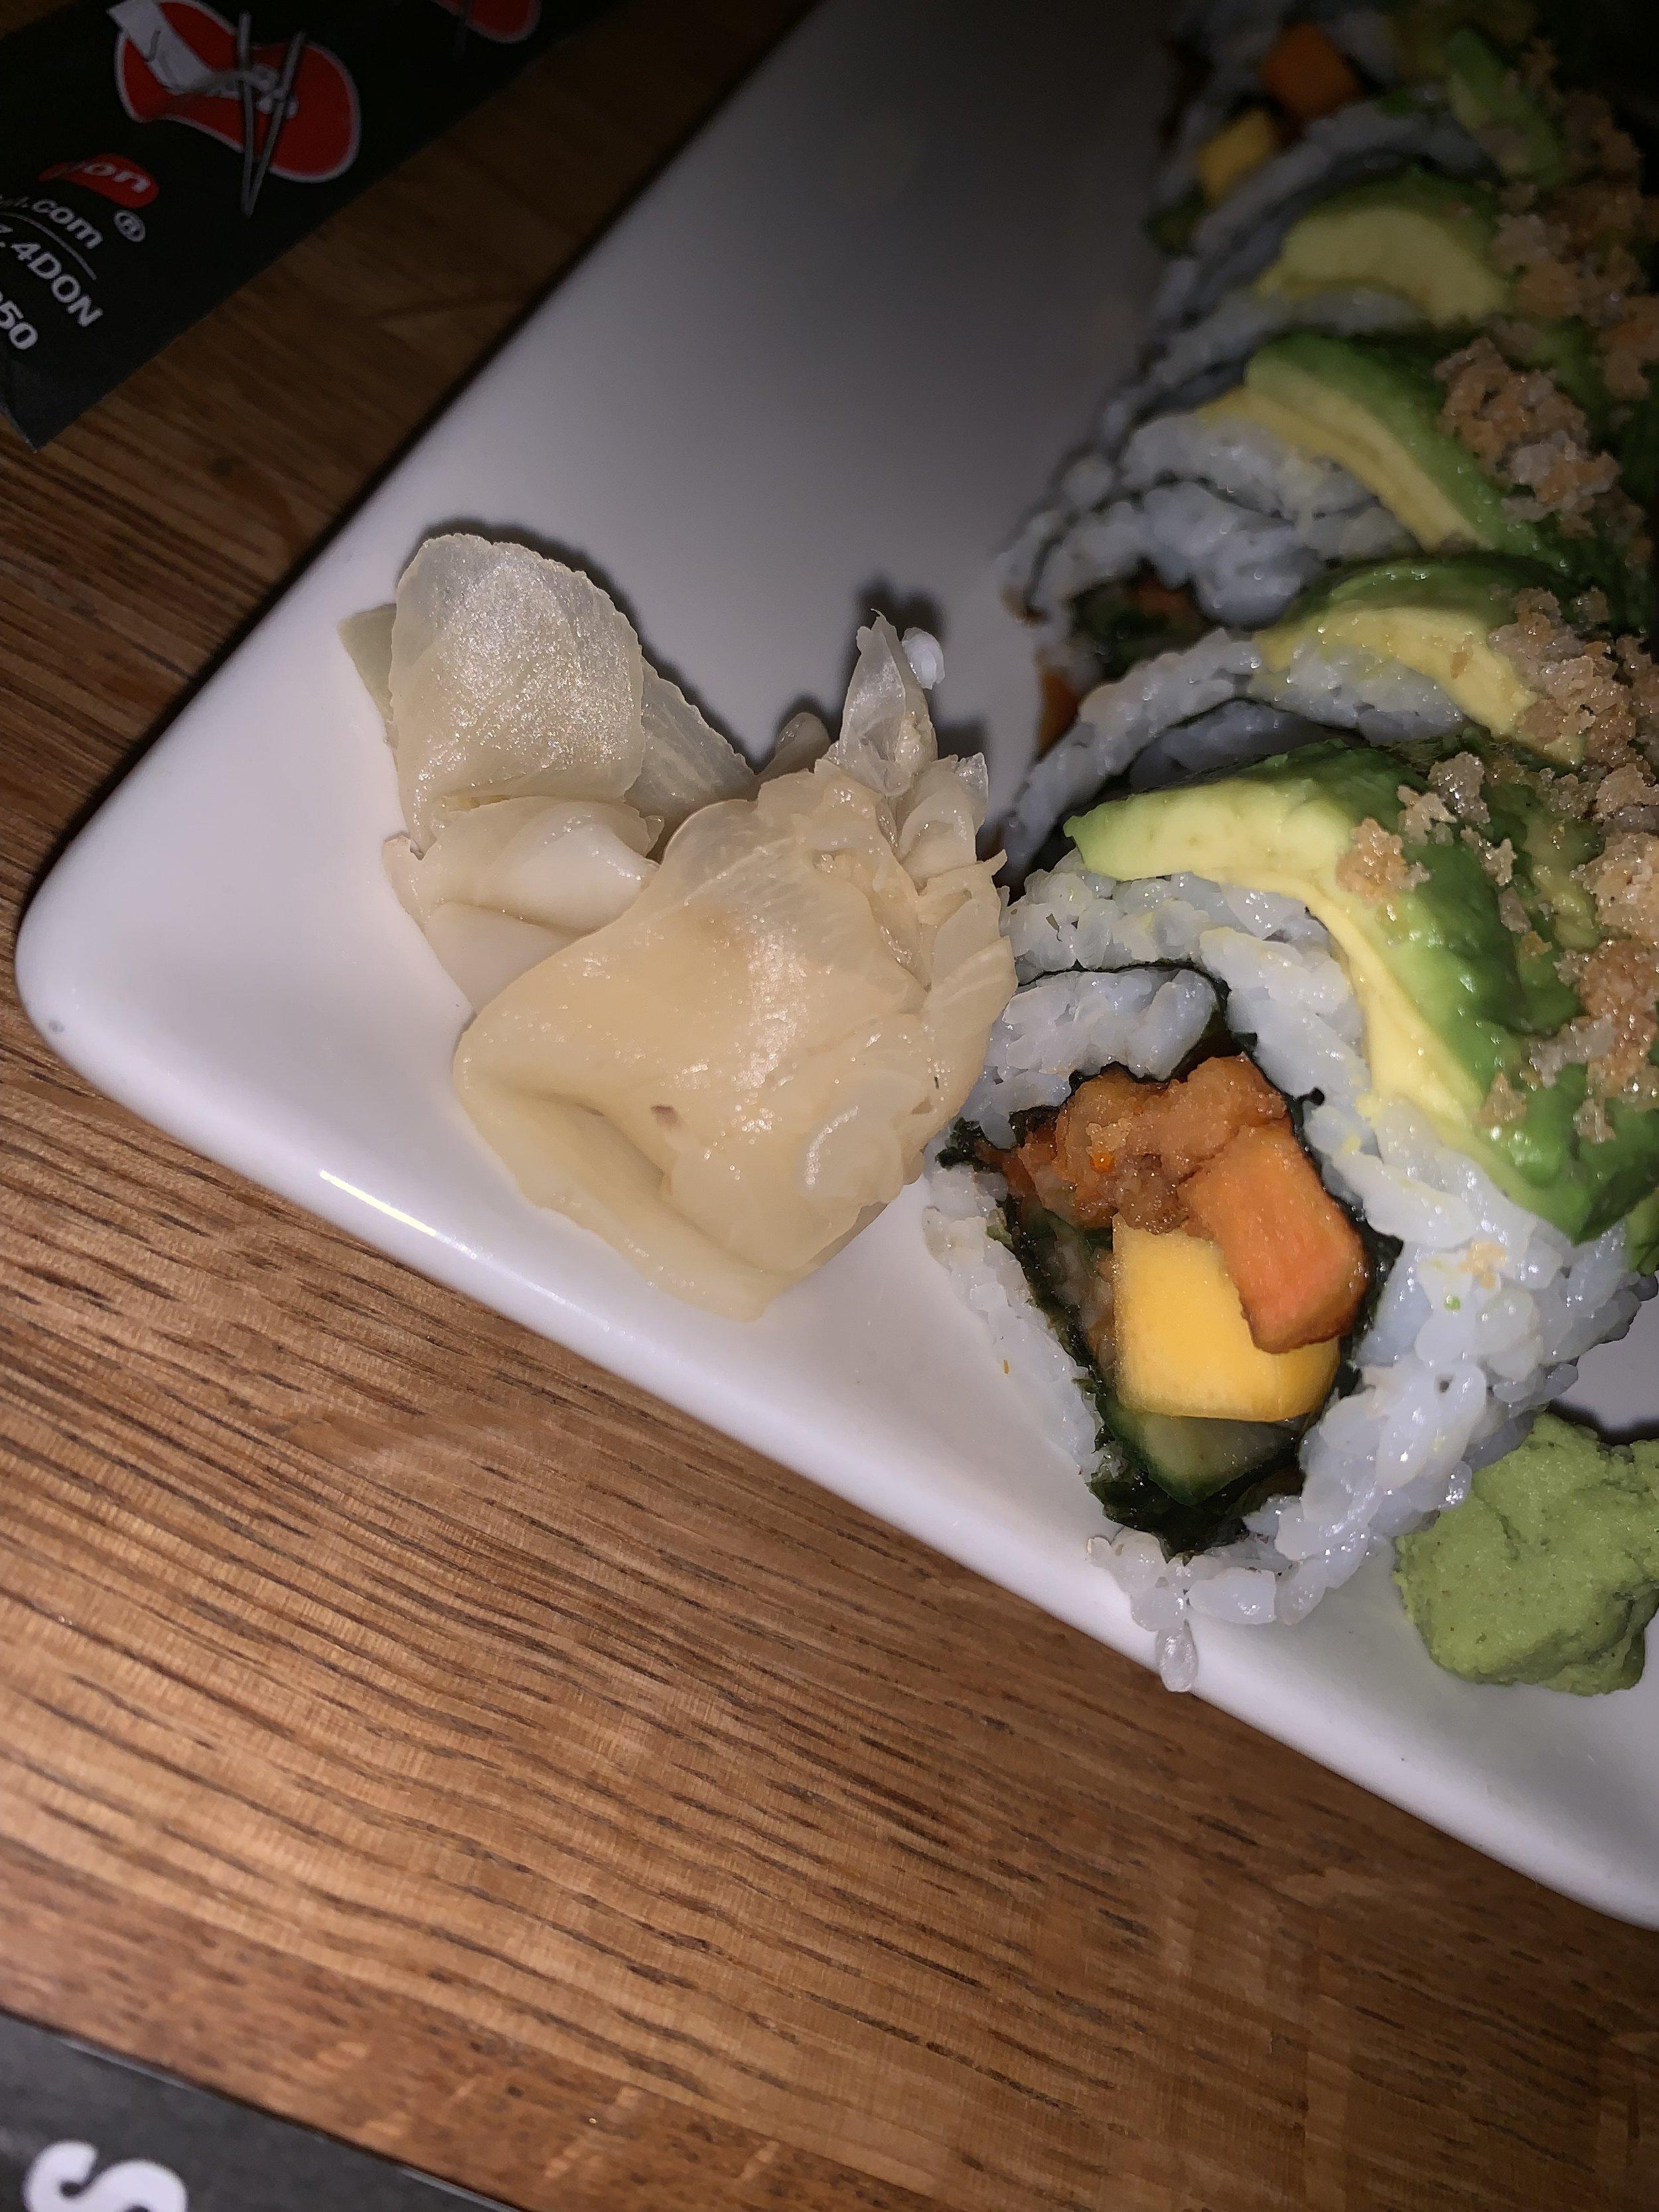 Green Dragon :  Vegan roll with avocado, yam, mango, cucumber, sriracha